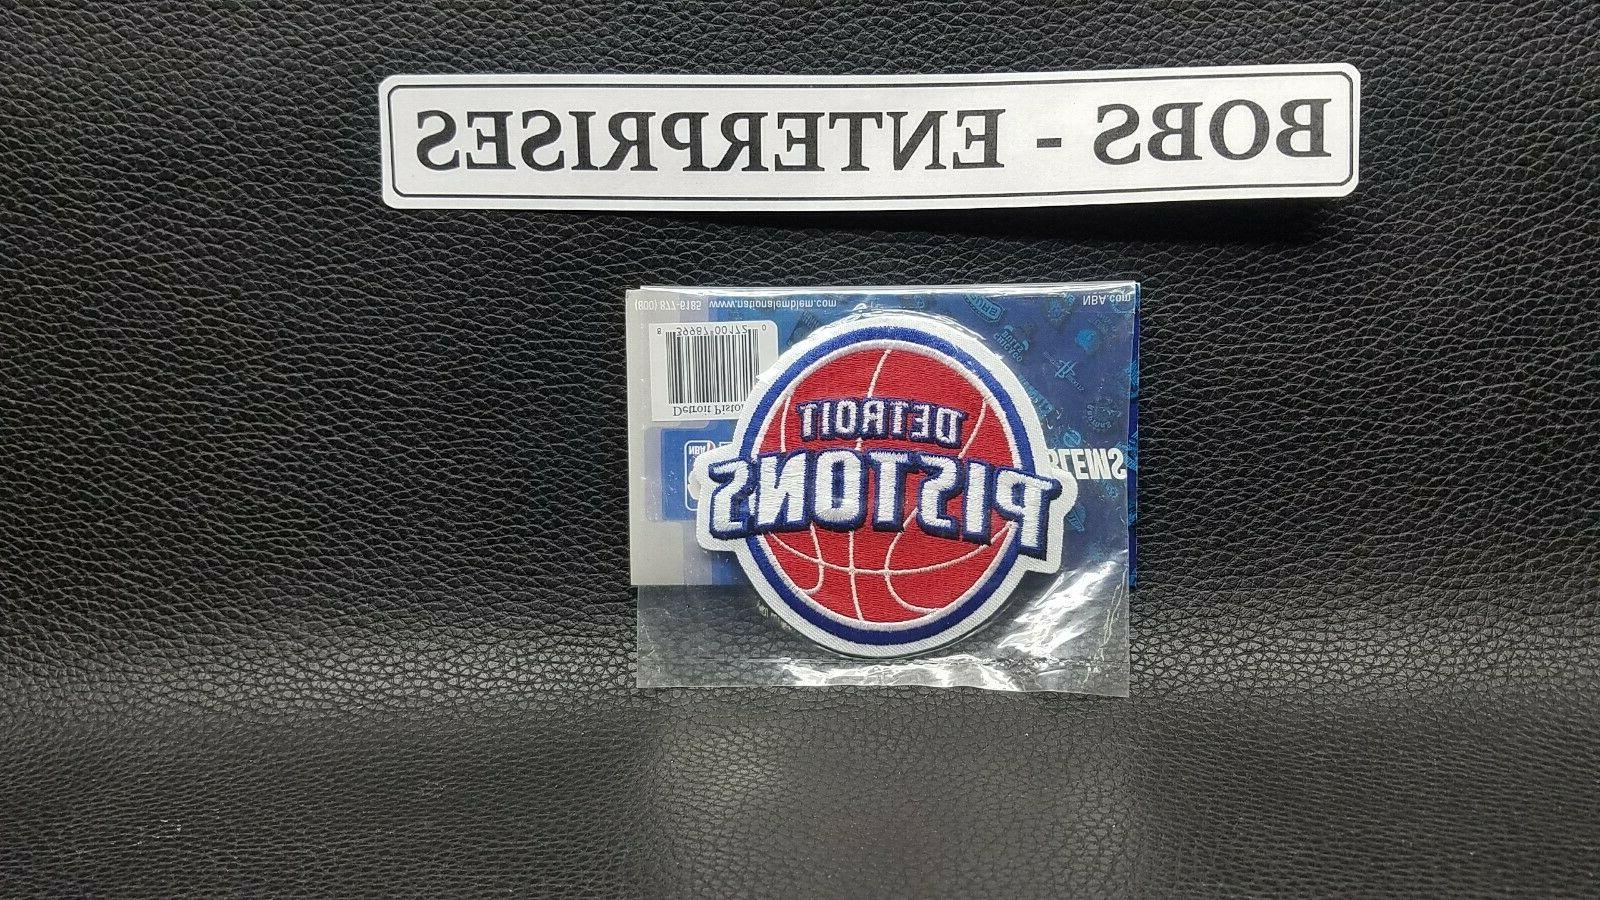 official detroit pistons logo nba basketball patch